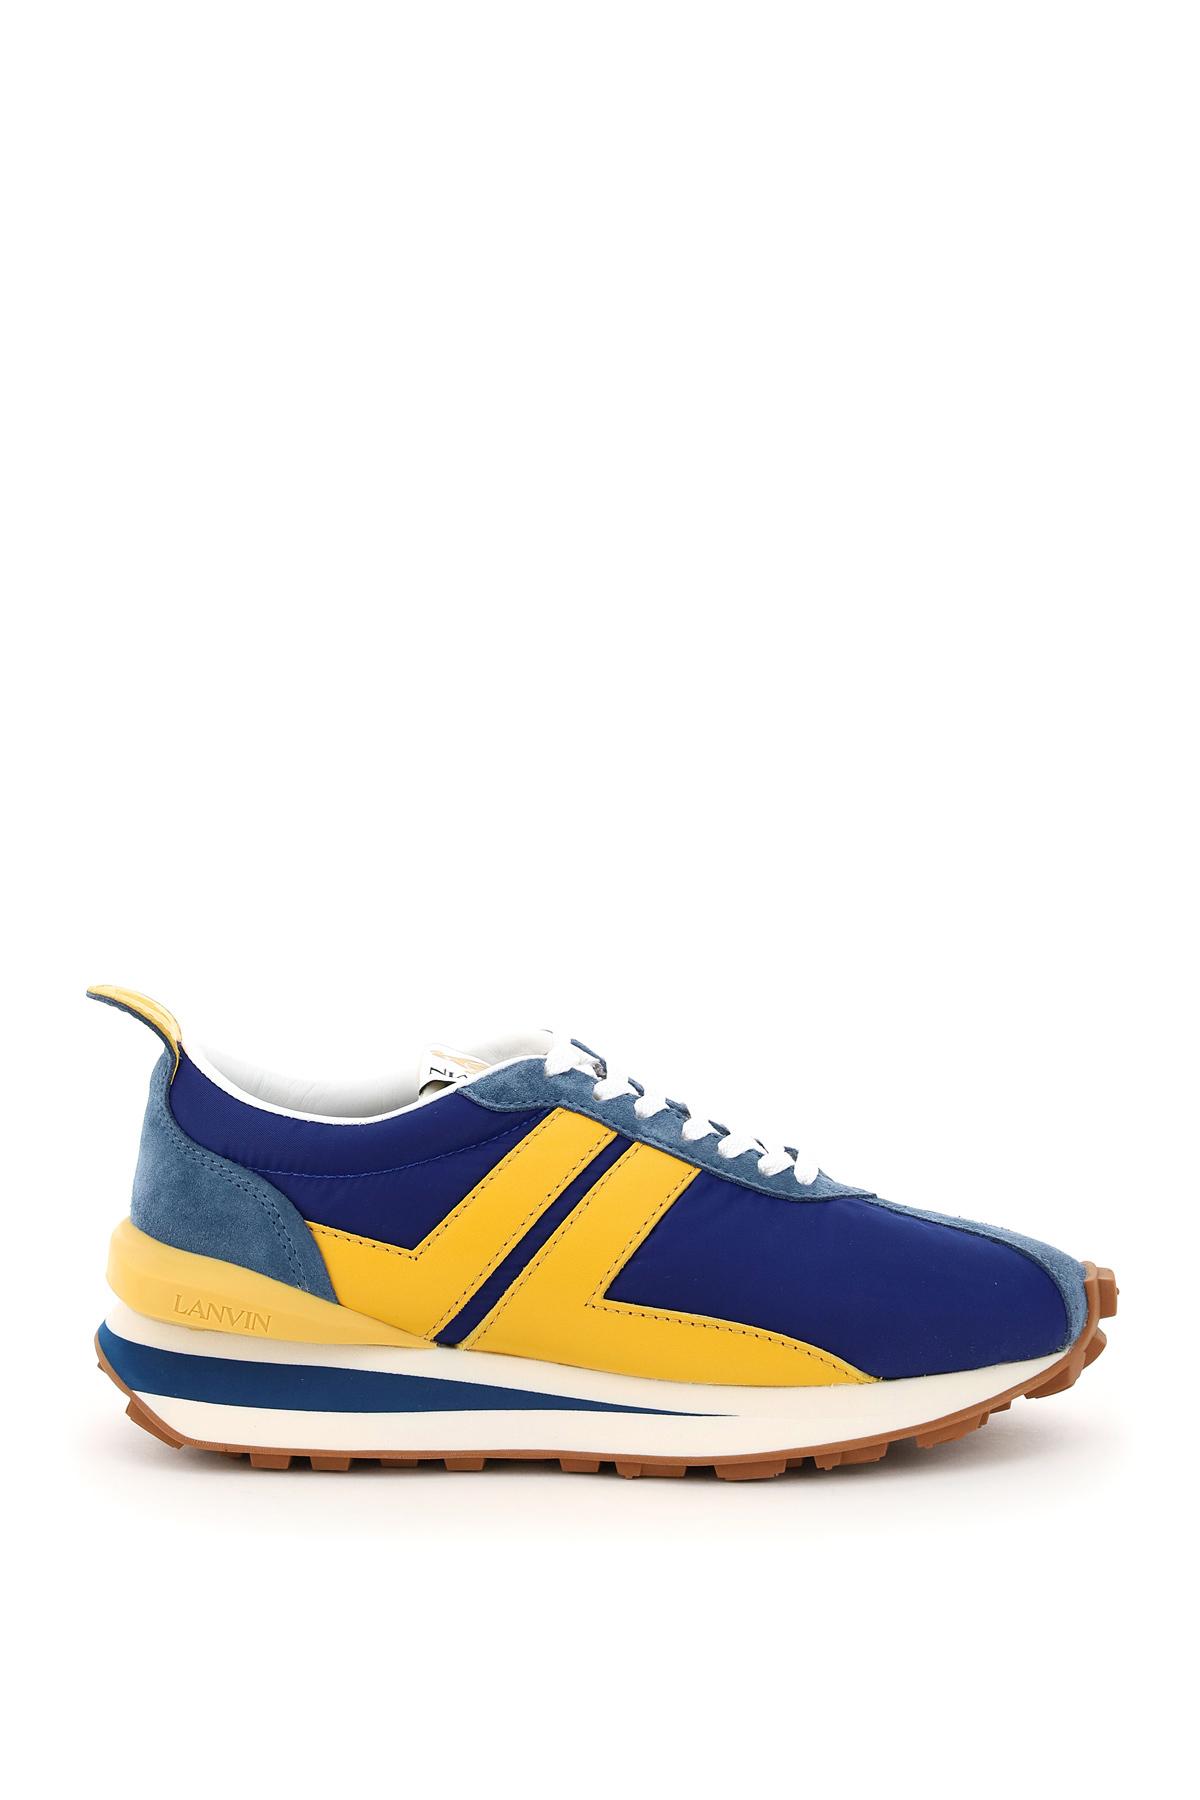 Lanvin sneakers bumper